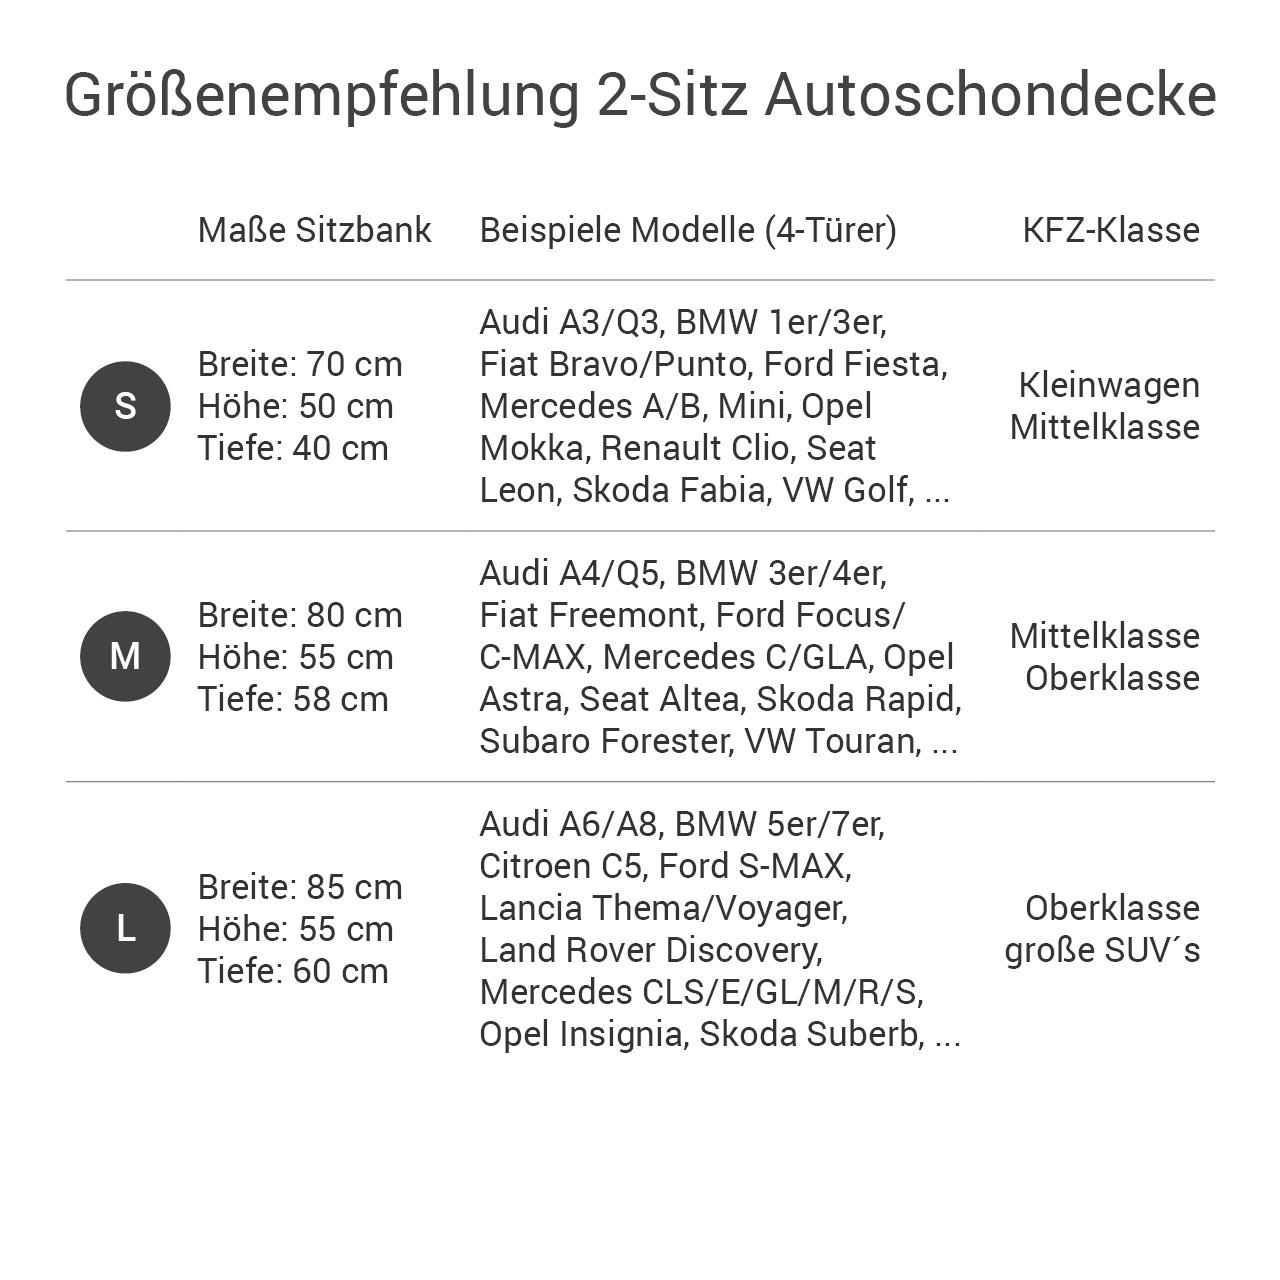 Doctor Bark - Autoschondecke für Hunde - Rückbank 2-Sitz Gr. S - grau